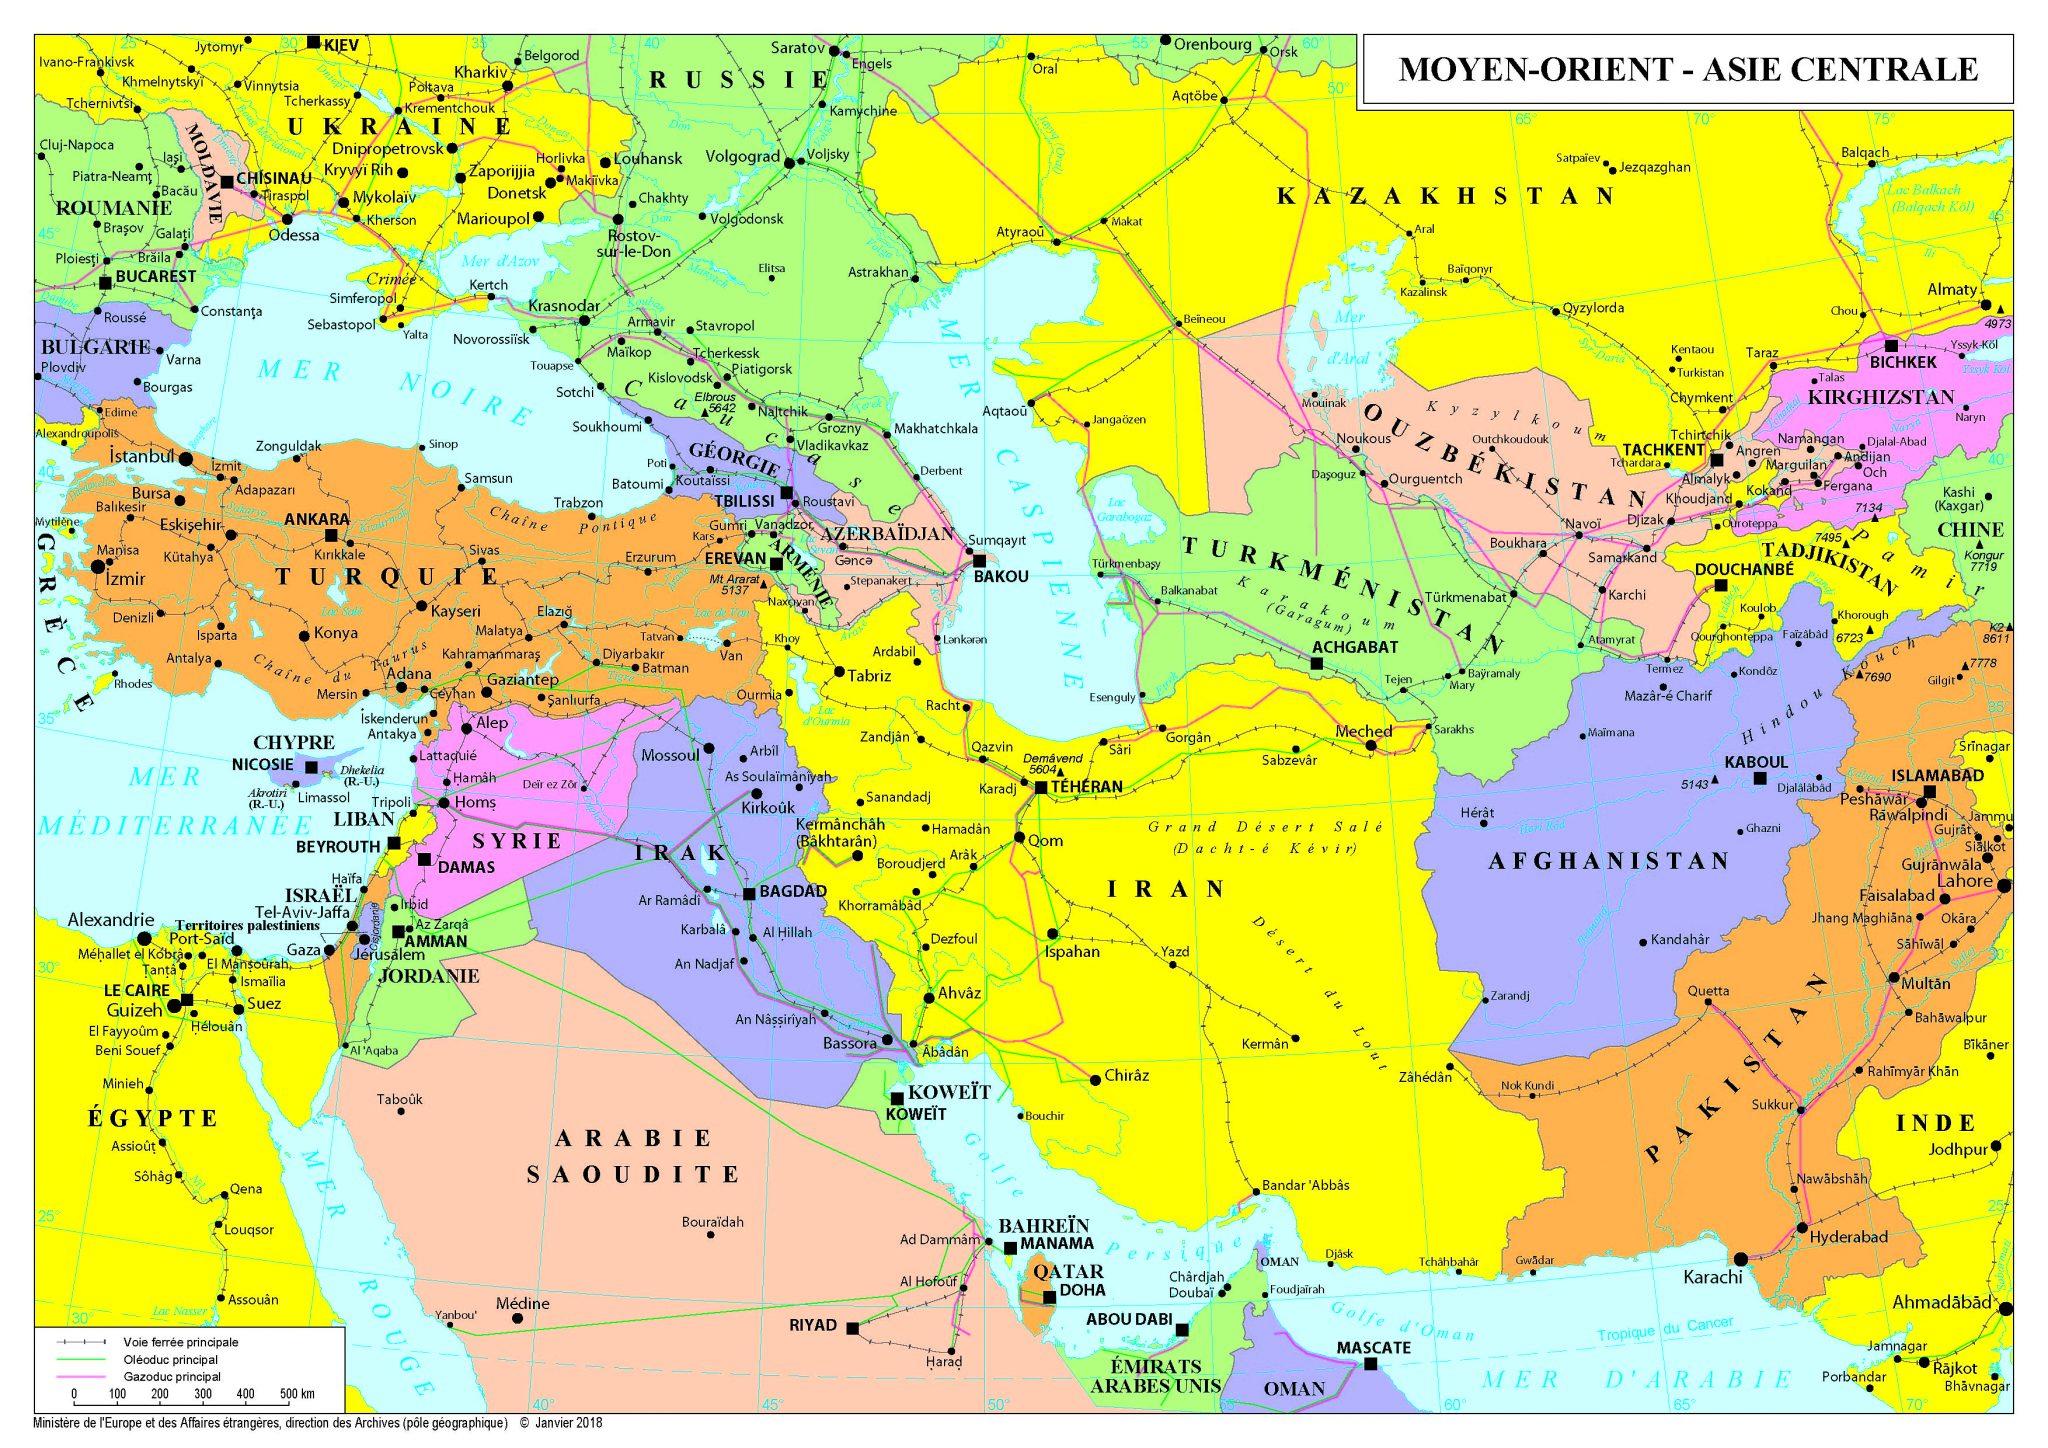 Moyen-Orient rencontres sites Web